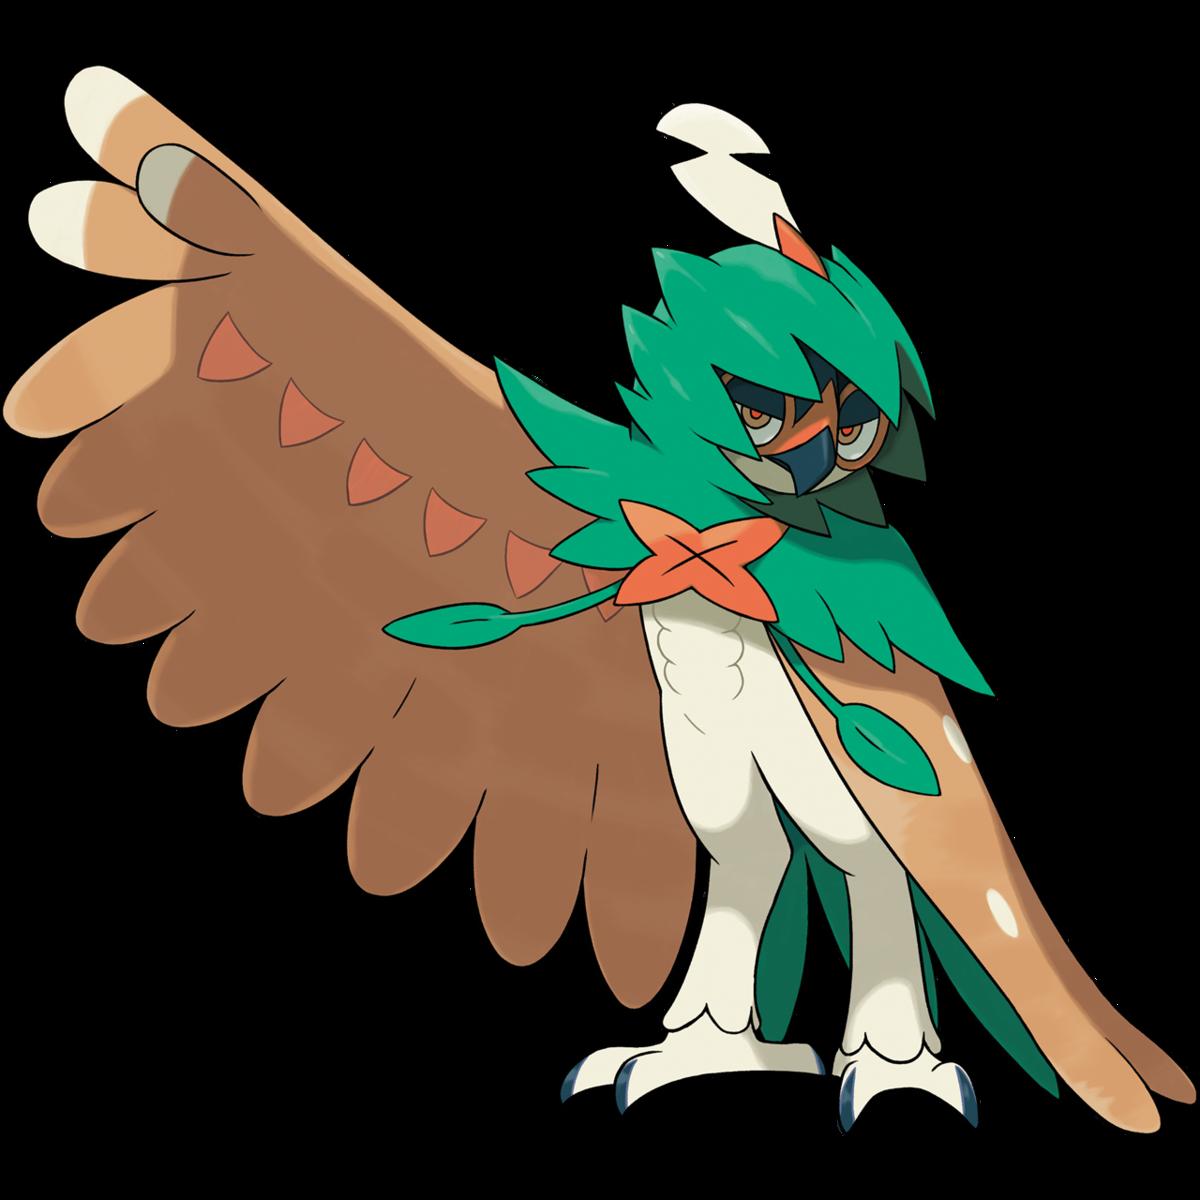 Cool sun blinking eye clipart svg freeuse library Decidueye (Pokémon) - Bulbapedia, the community-driven Pokémon ... svg freeuse library